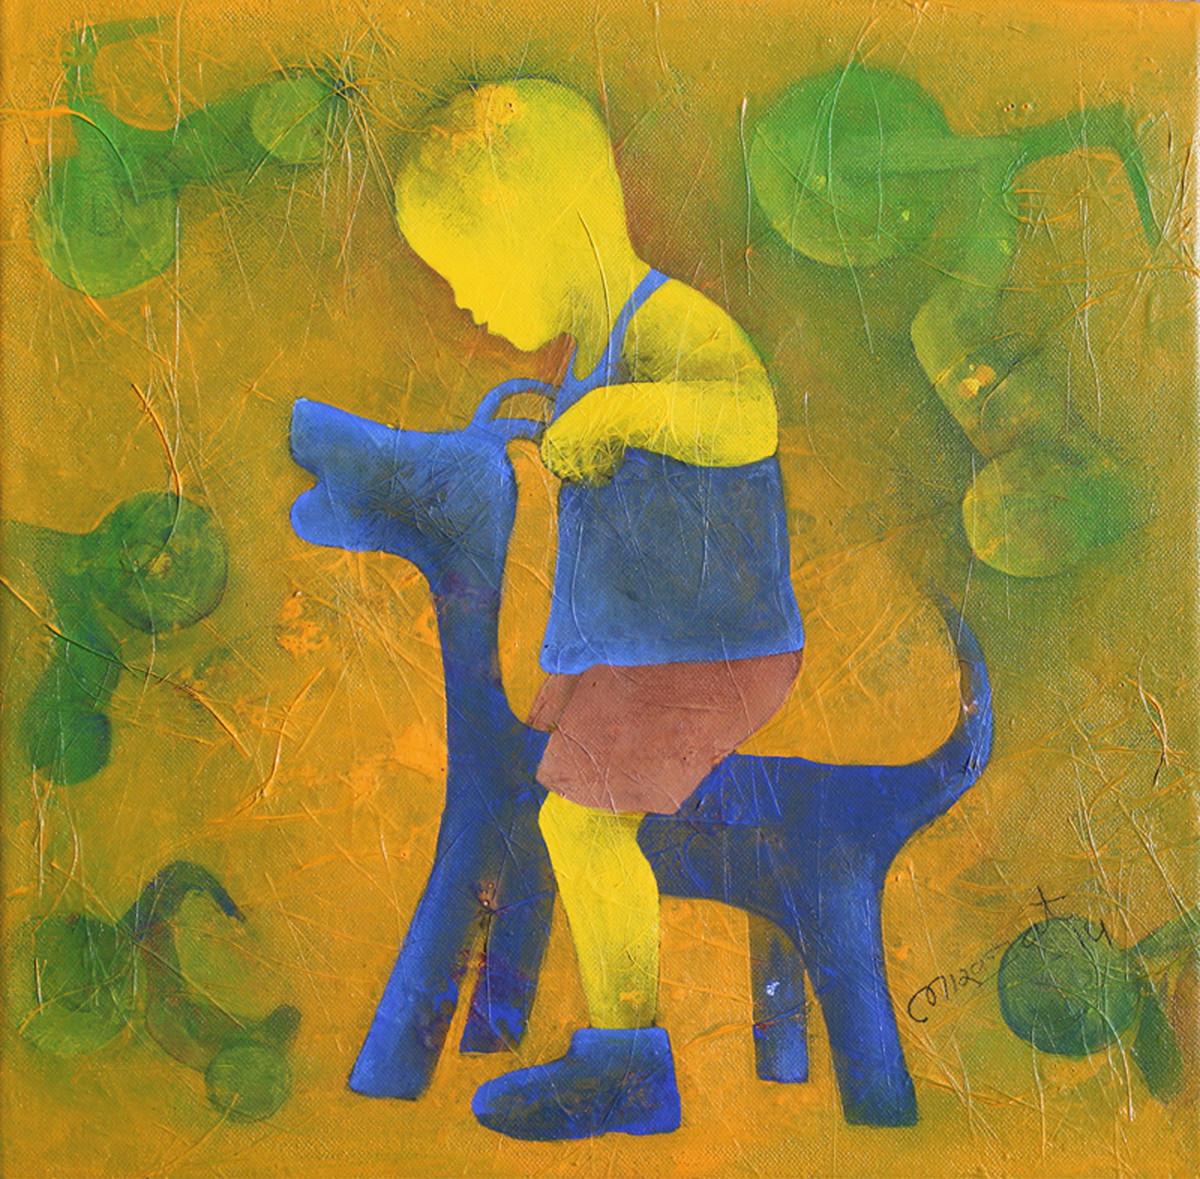 Athkheliya11_1 by Lakhan Singh Jat, Decorative, Decorative, Impressionism, Impressionism Painting, Acrylic on Canvas, Green color